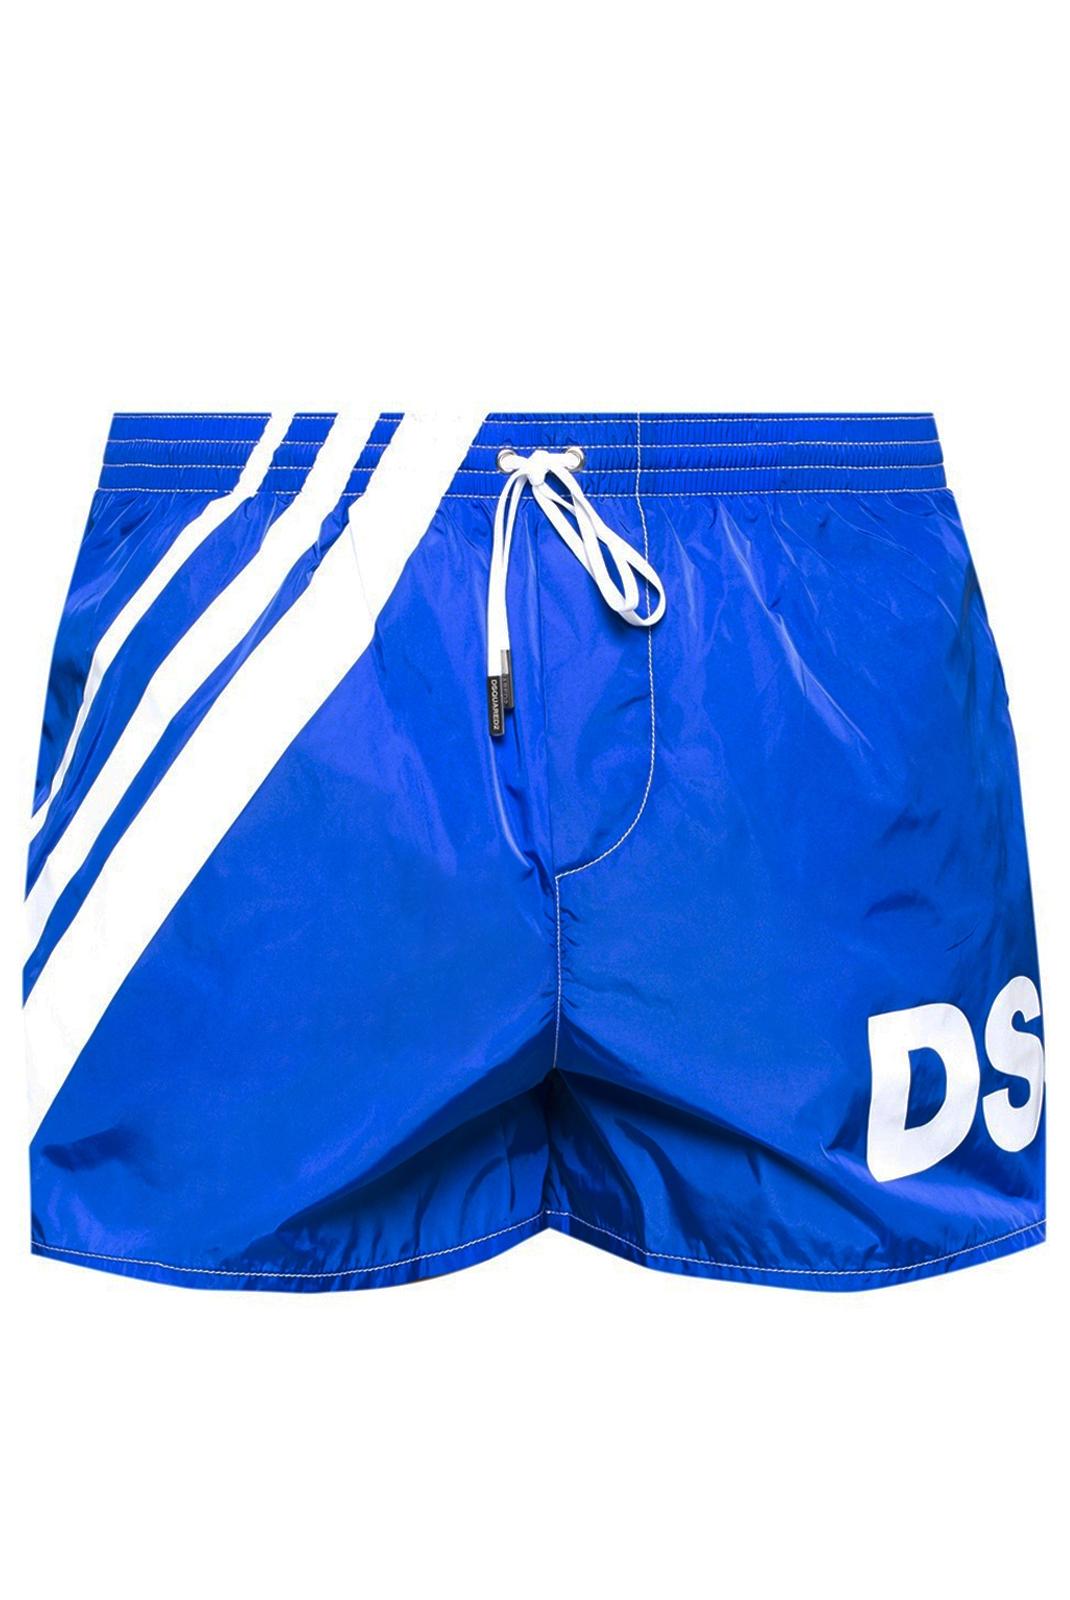 Shorts de bain  Dsquared2 D7B641950 33046 BLEU